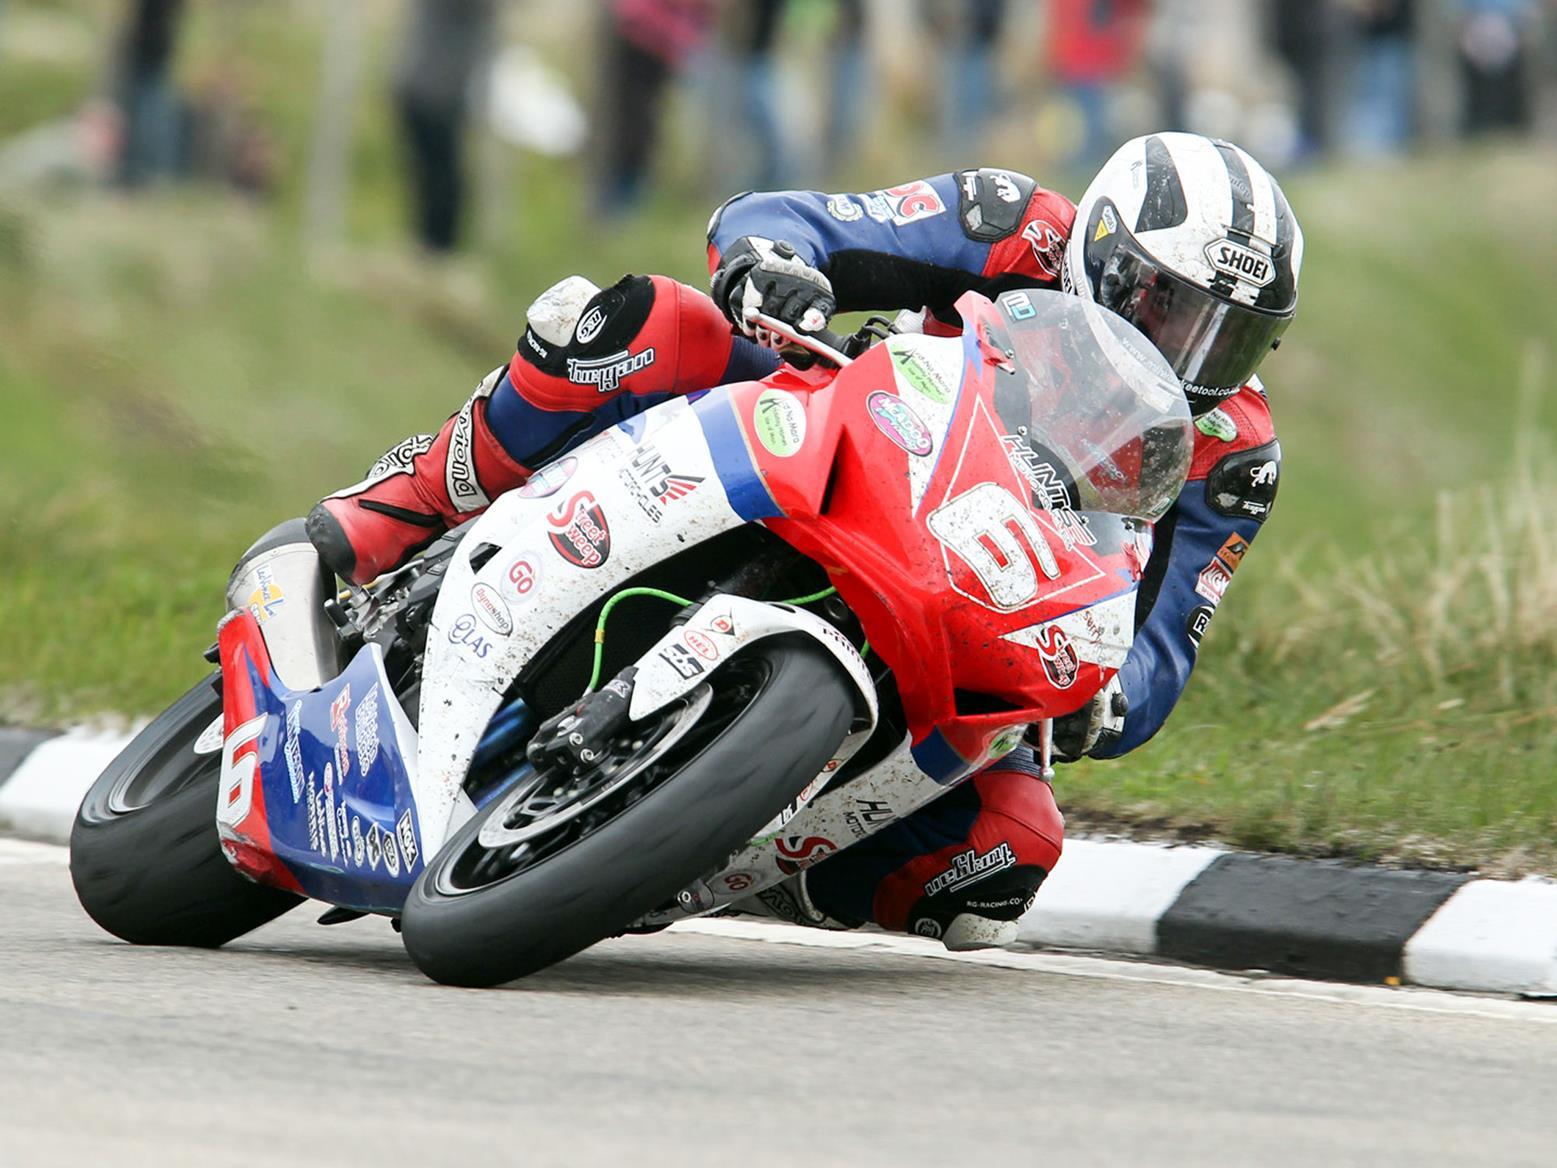 Michael Dunlop in 2013 Superstock TT race